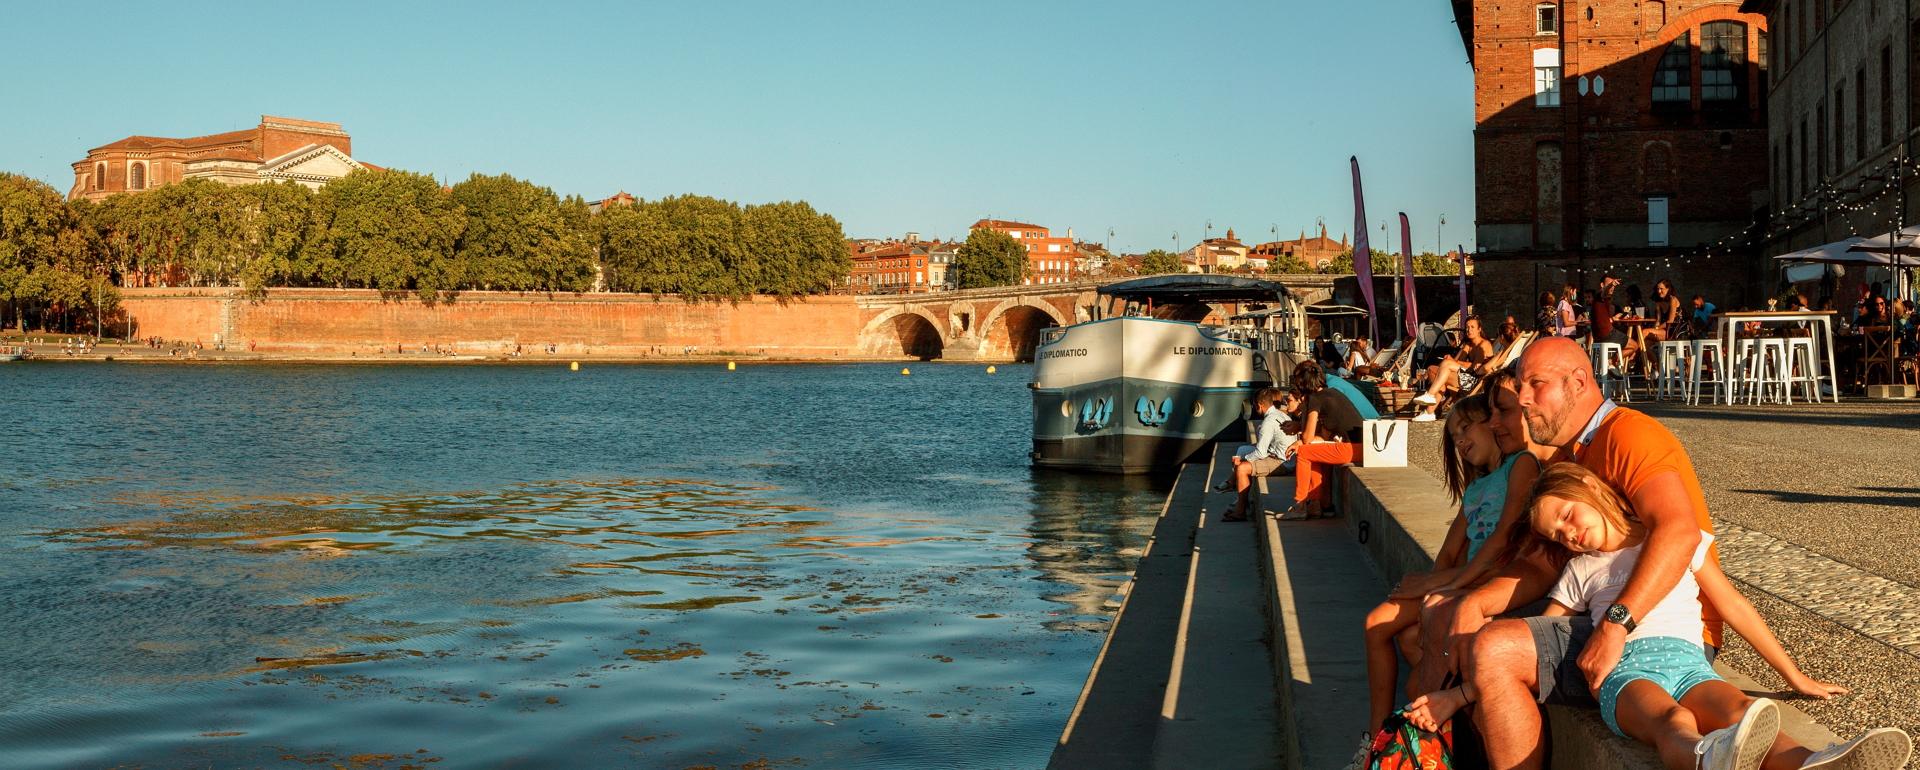 Toulouse Quais face au quai de la Daurade